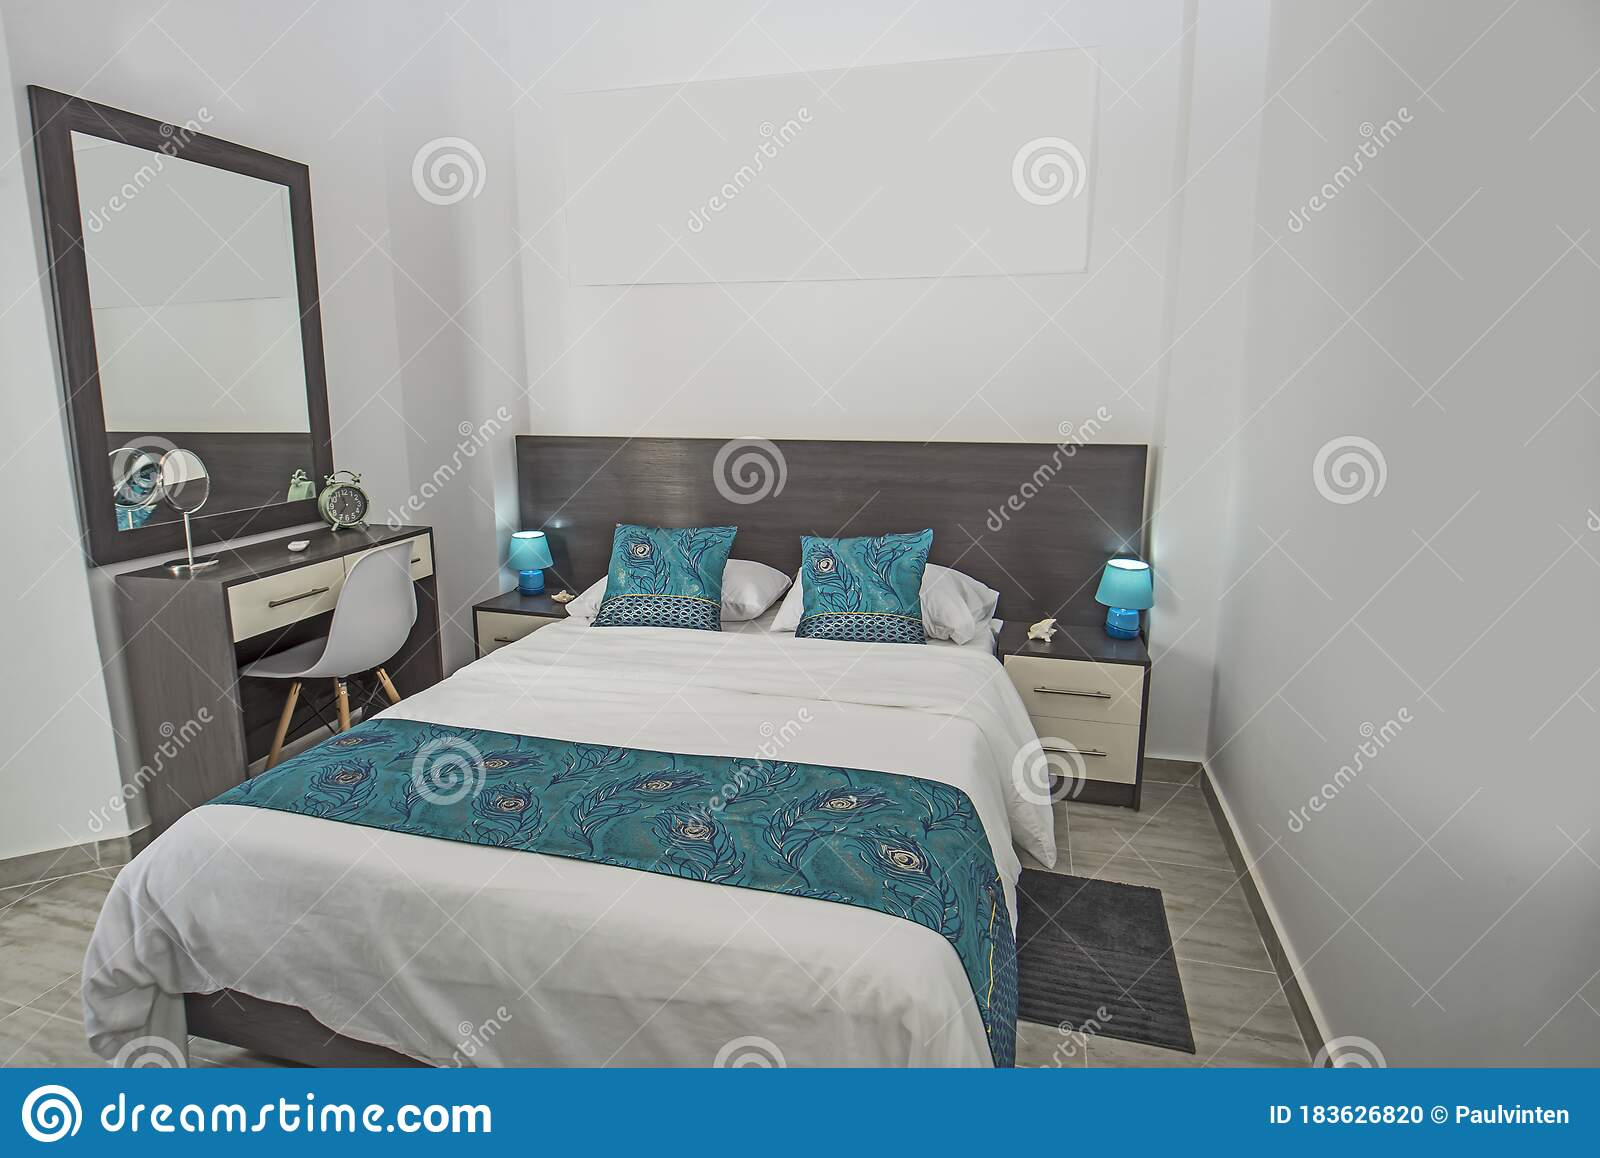 Interior Design Of Bedroom In House Stock Photo Image Of Bedside Floor 183626820